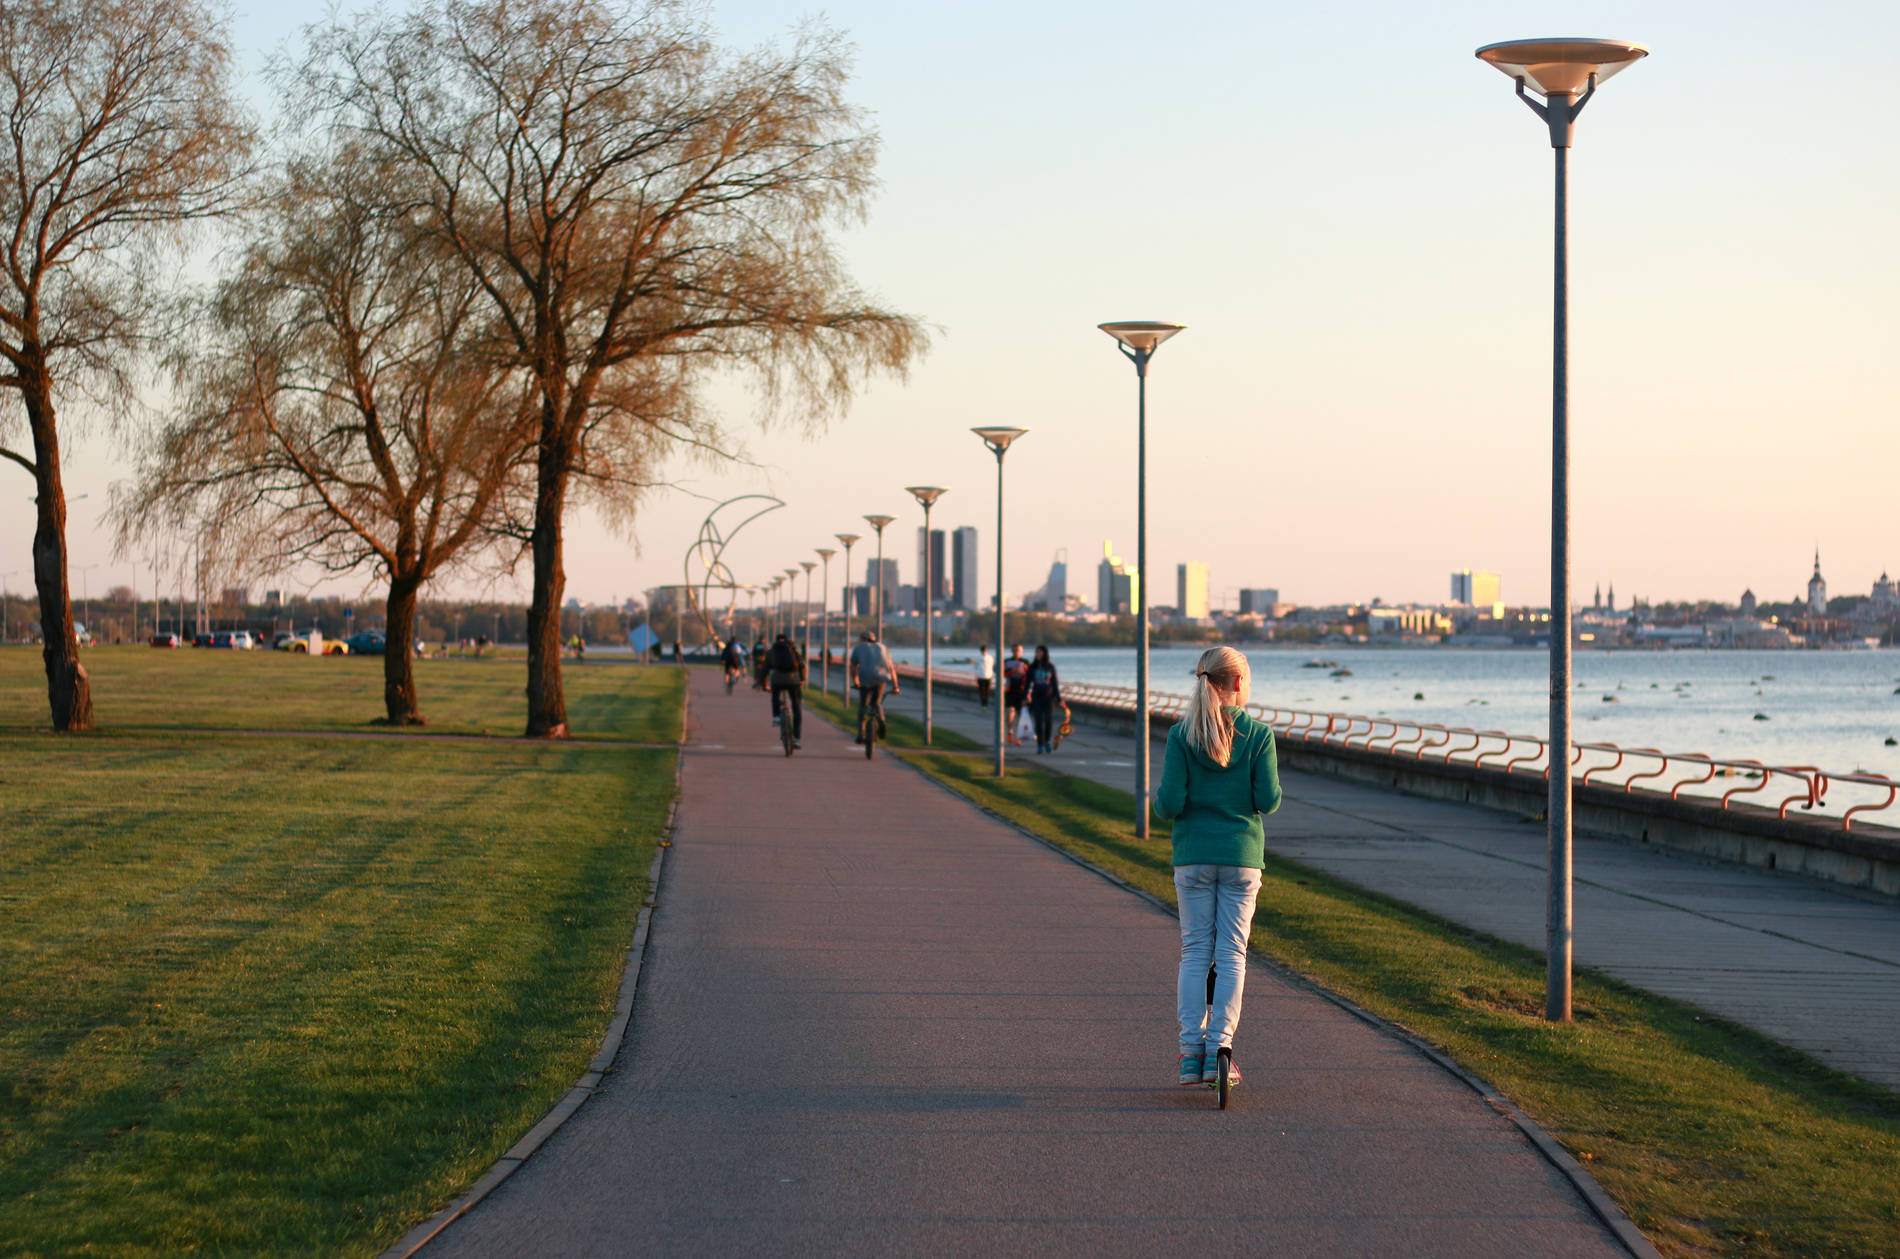 View of Pirita promenade. Photo by: Kadi-Liis Koppel